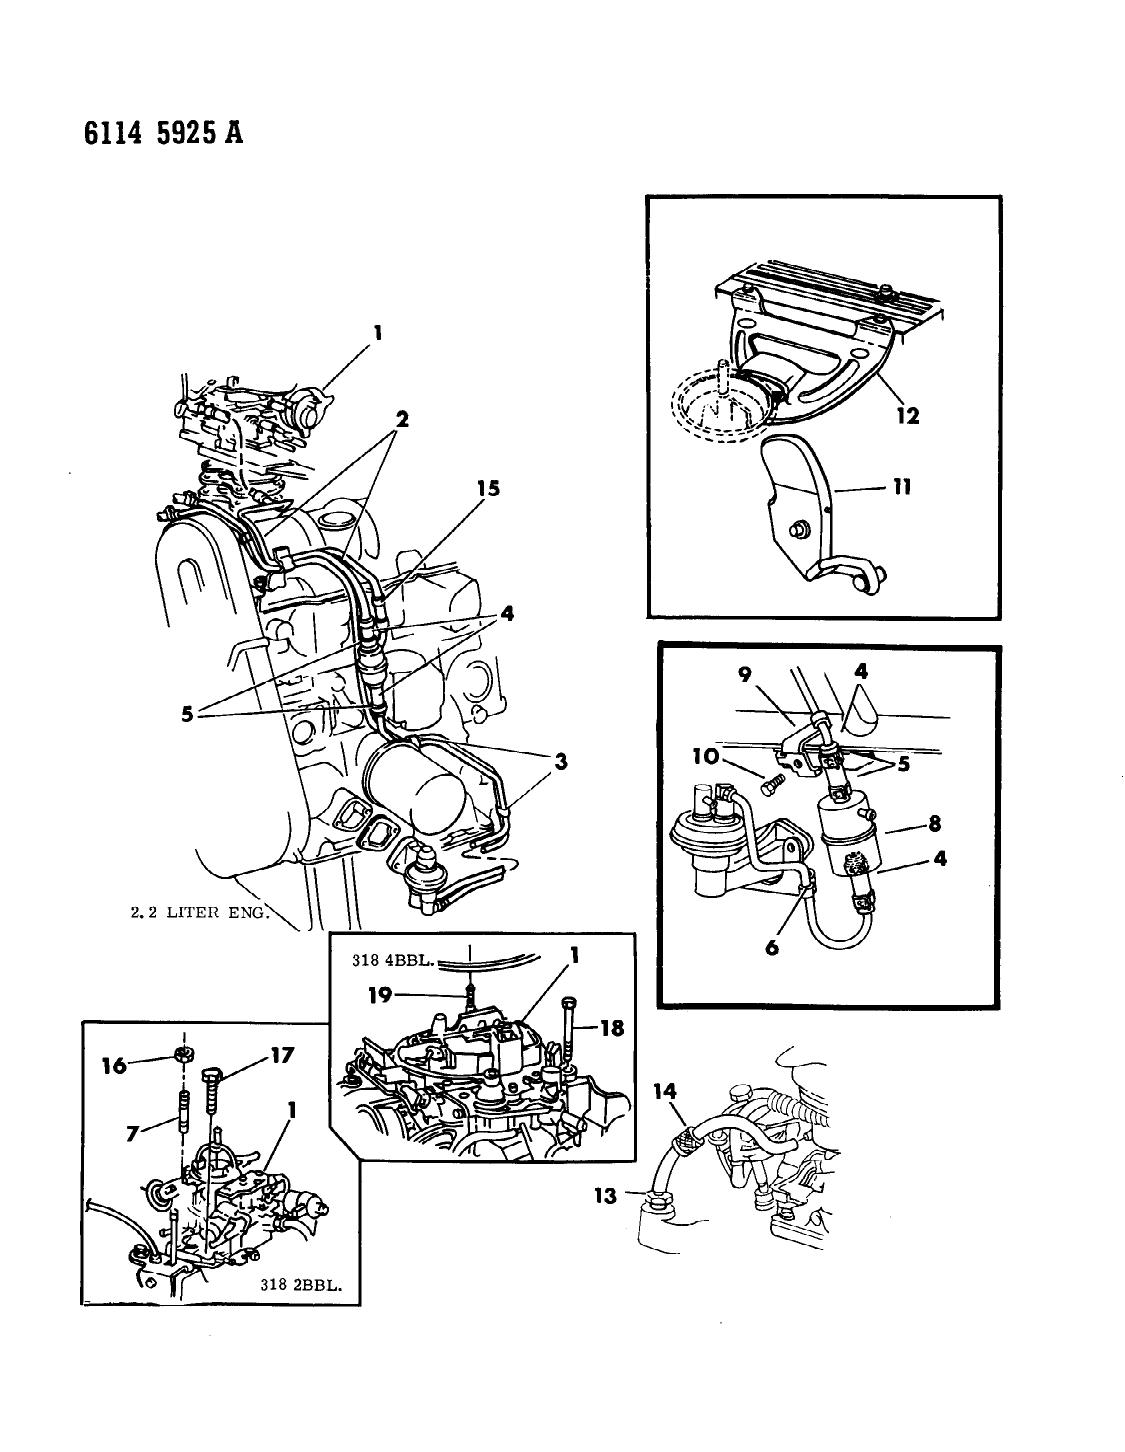 1986 Chrysler LeBaron Base Carburetor Fuel Filter & Related Parts -  Thumbnail 1